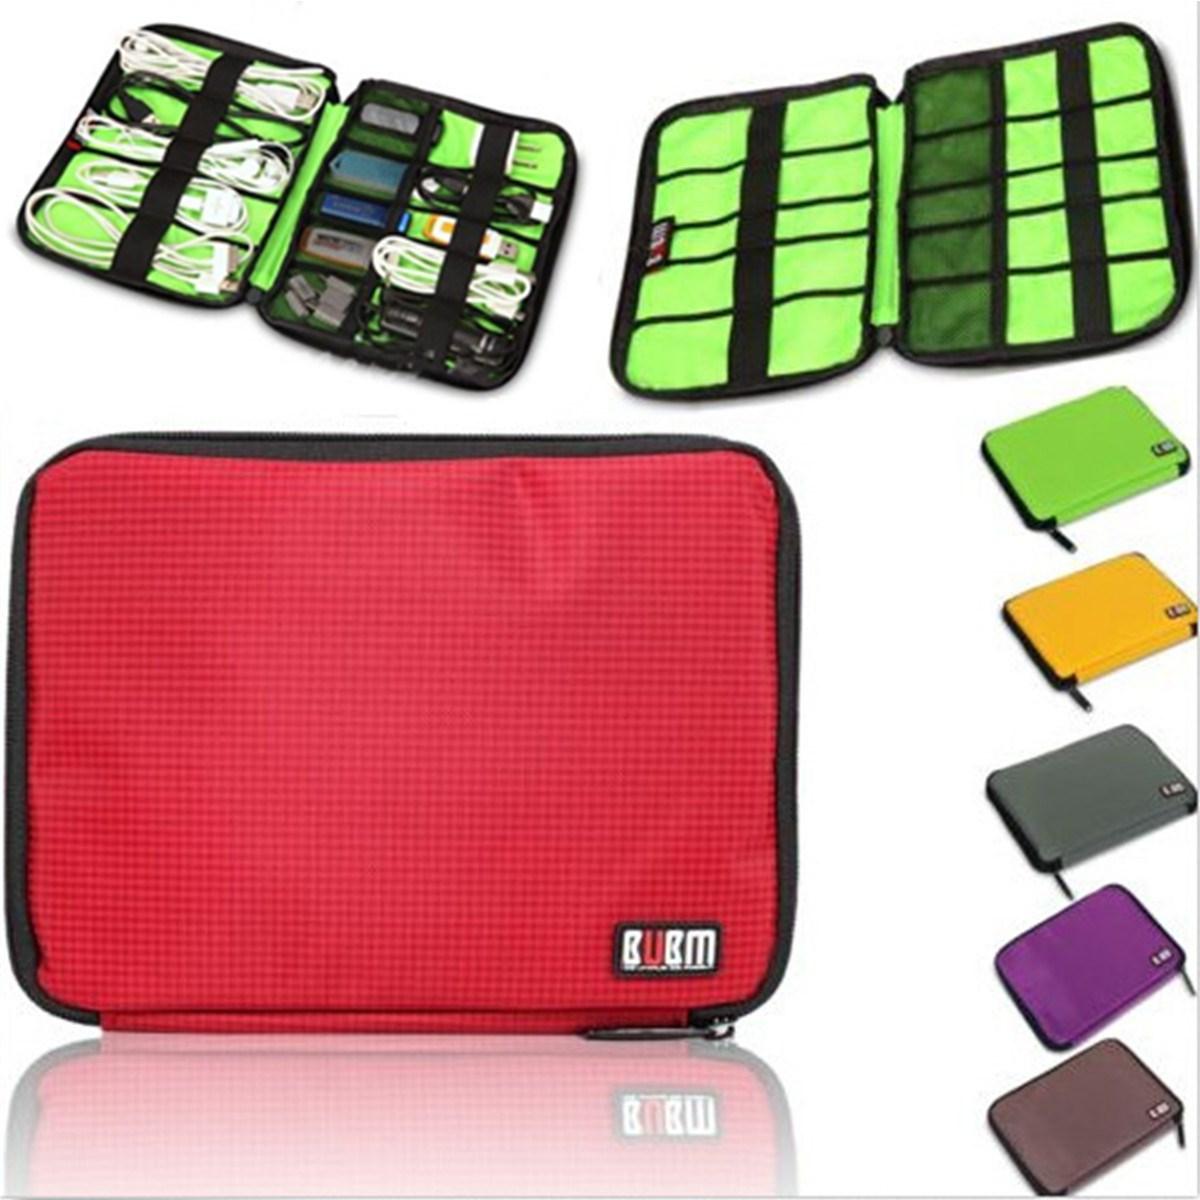 Modern Design BUBM 6 Colors Cable Organizer Bag Case Purse Can Put USB Flash Drive Hard